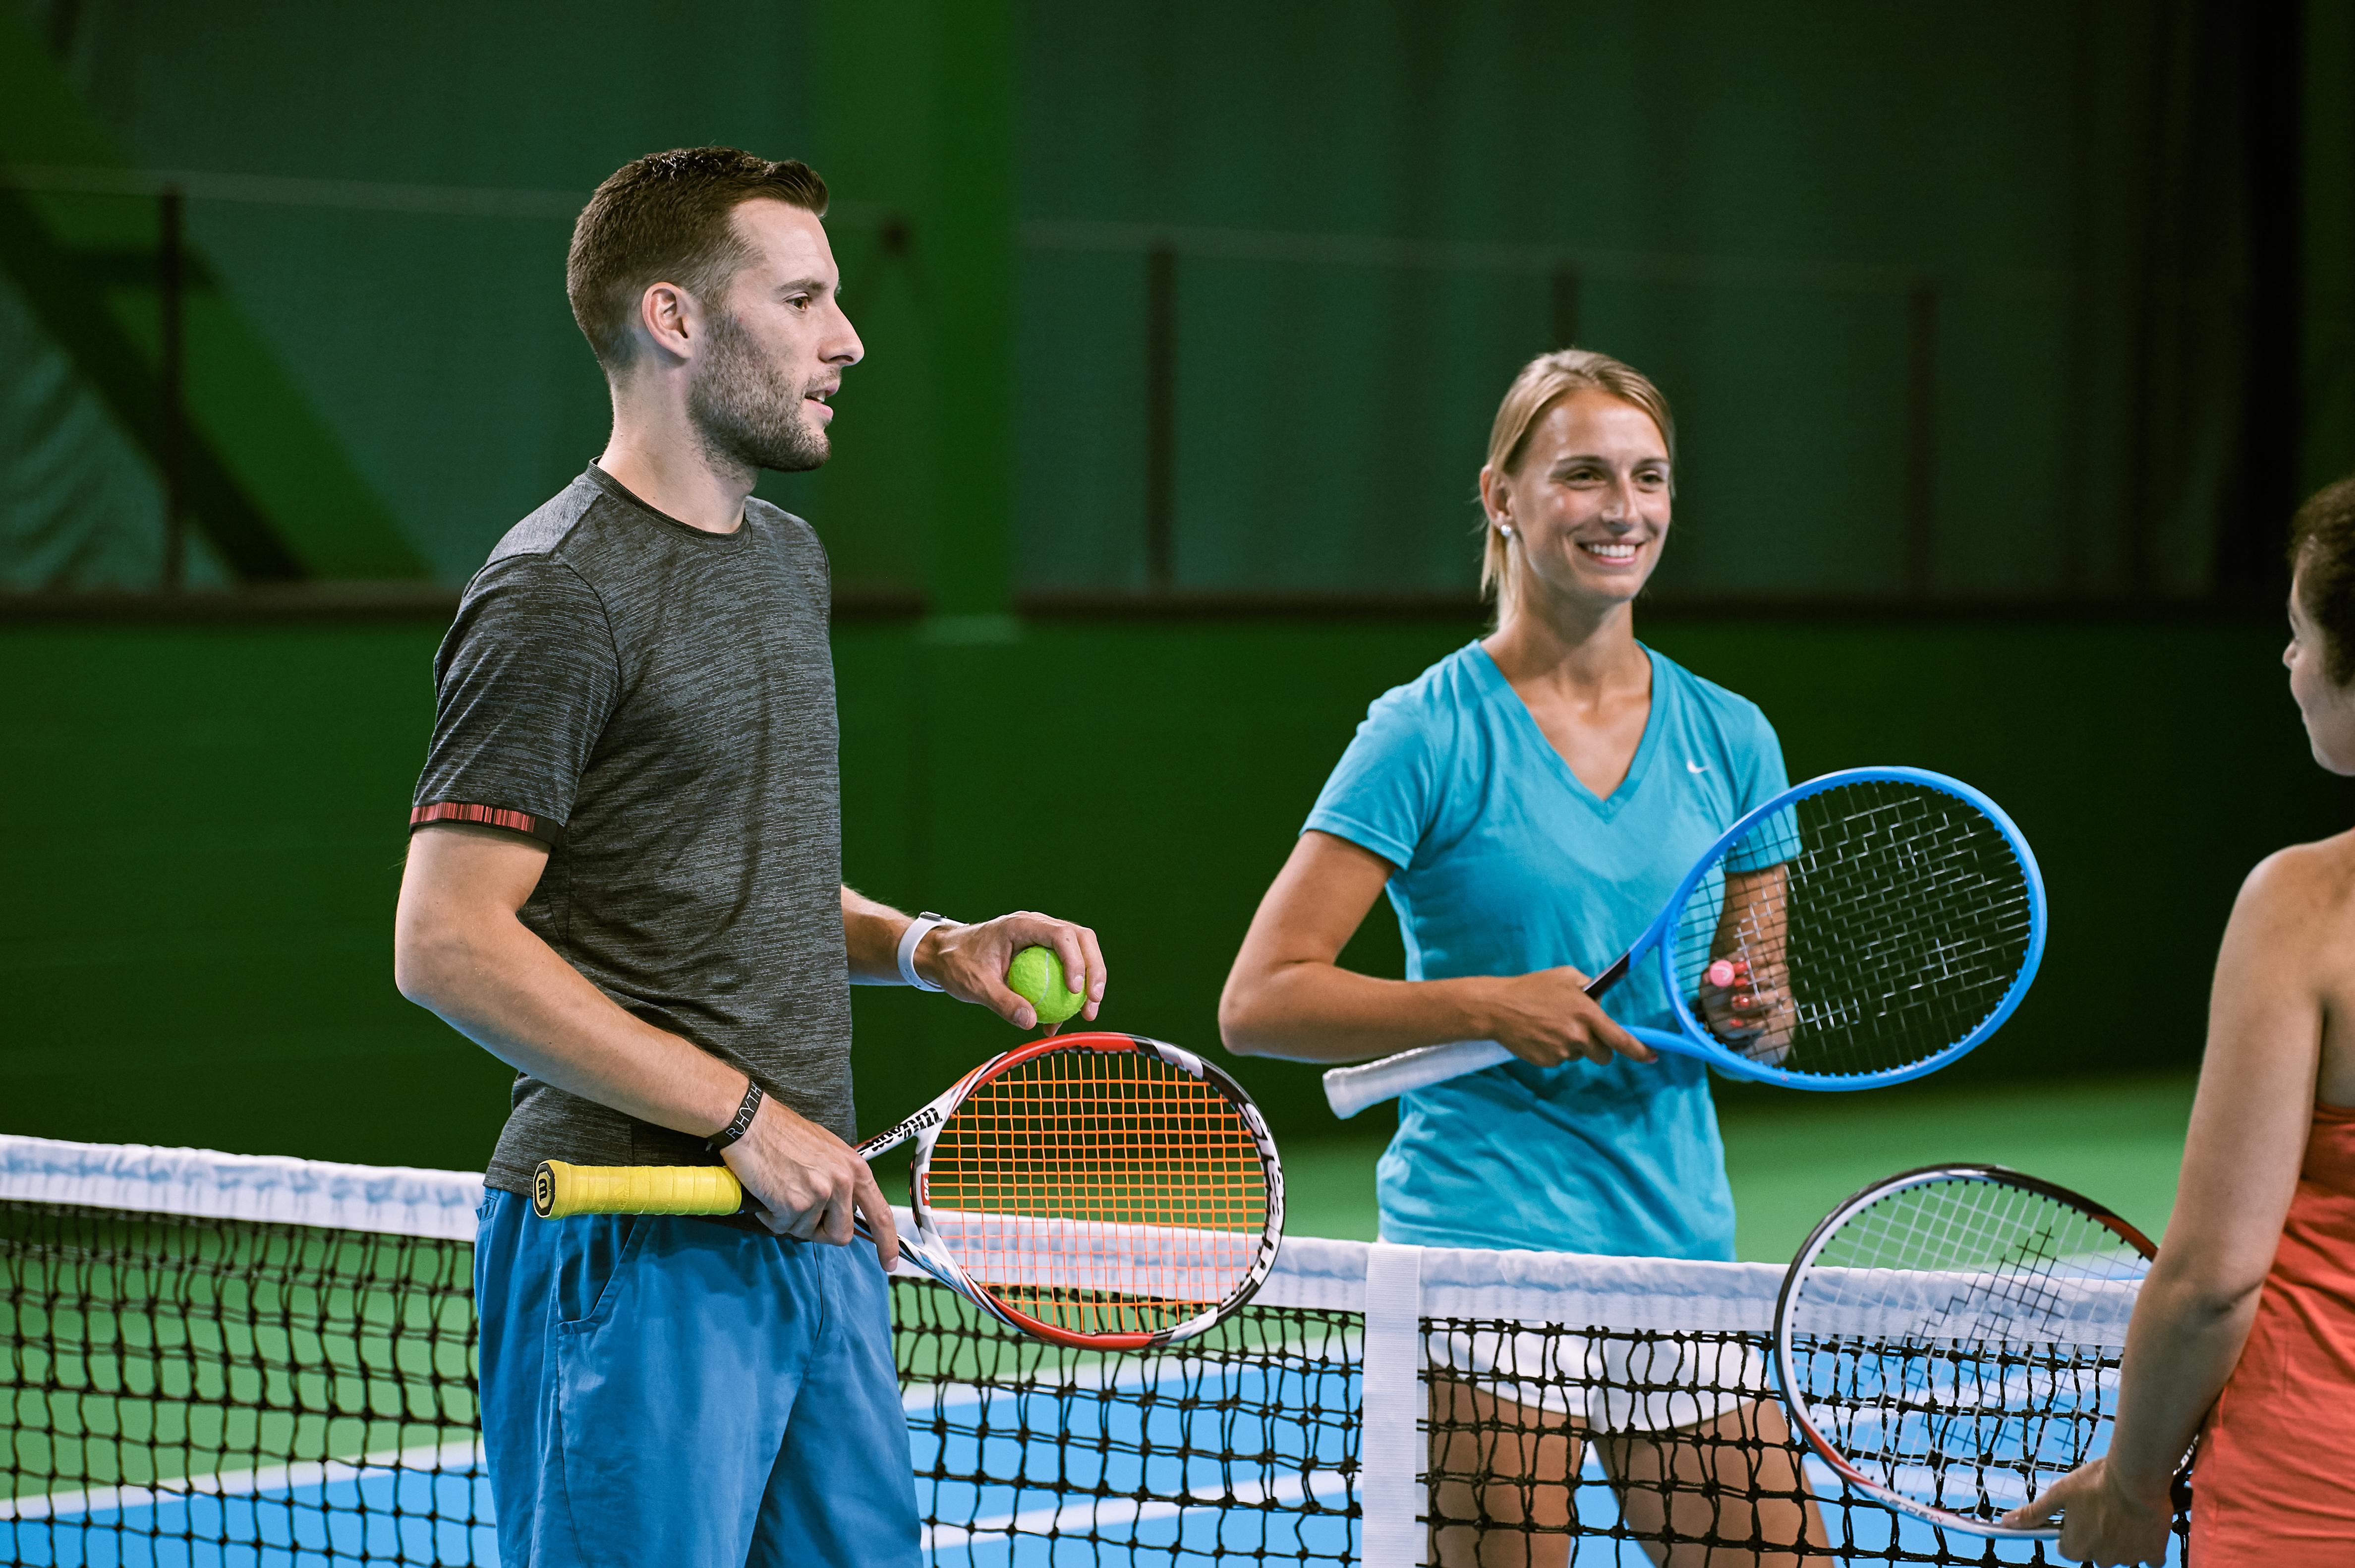 A man playing tennis